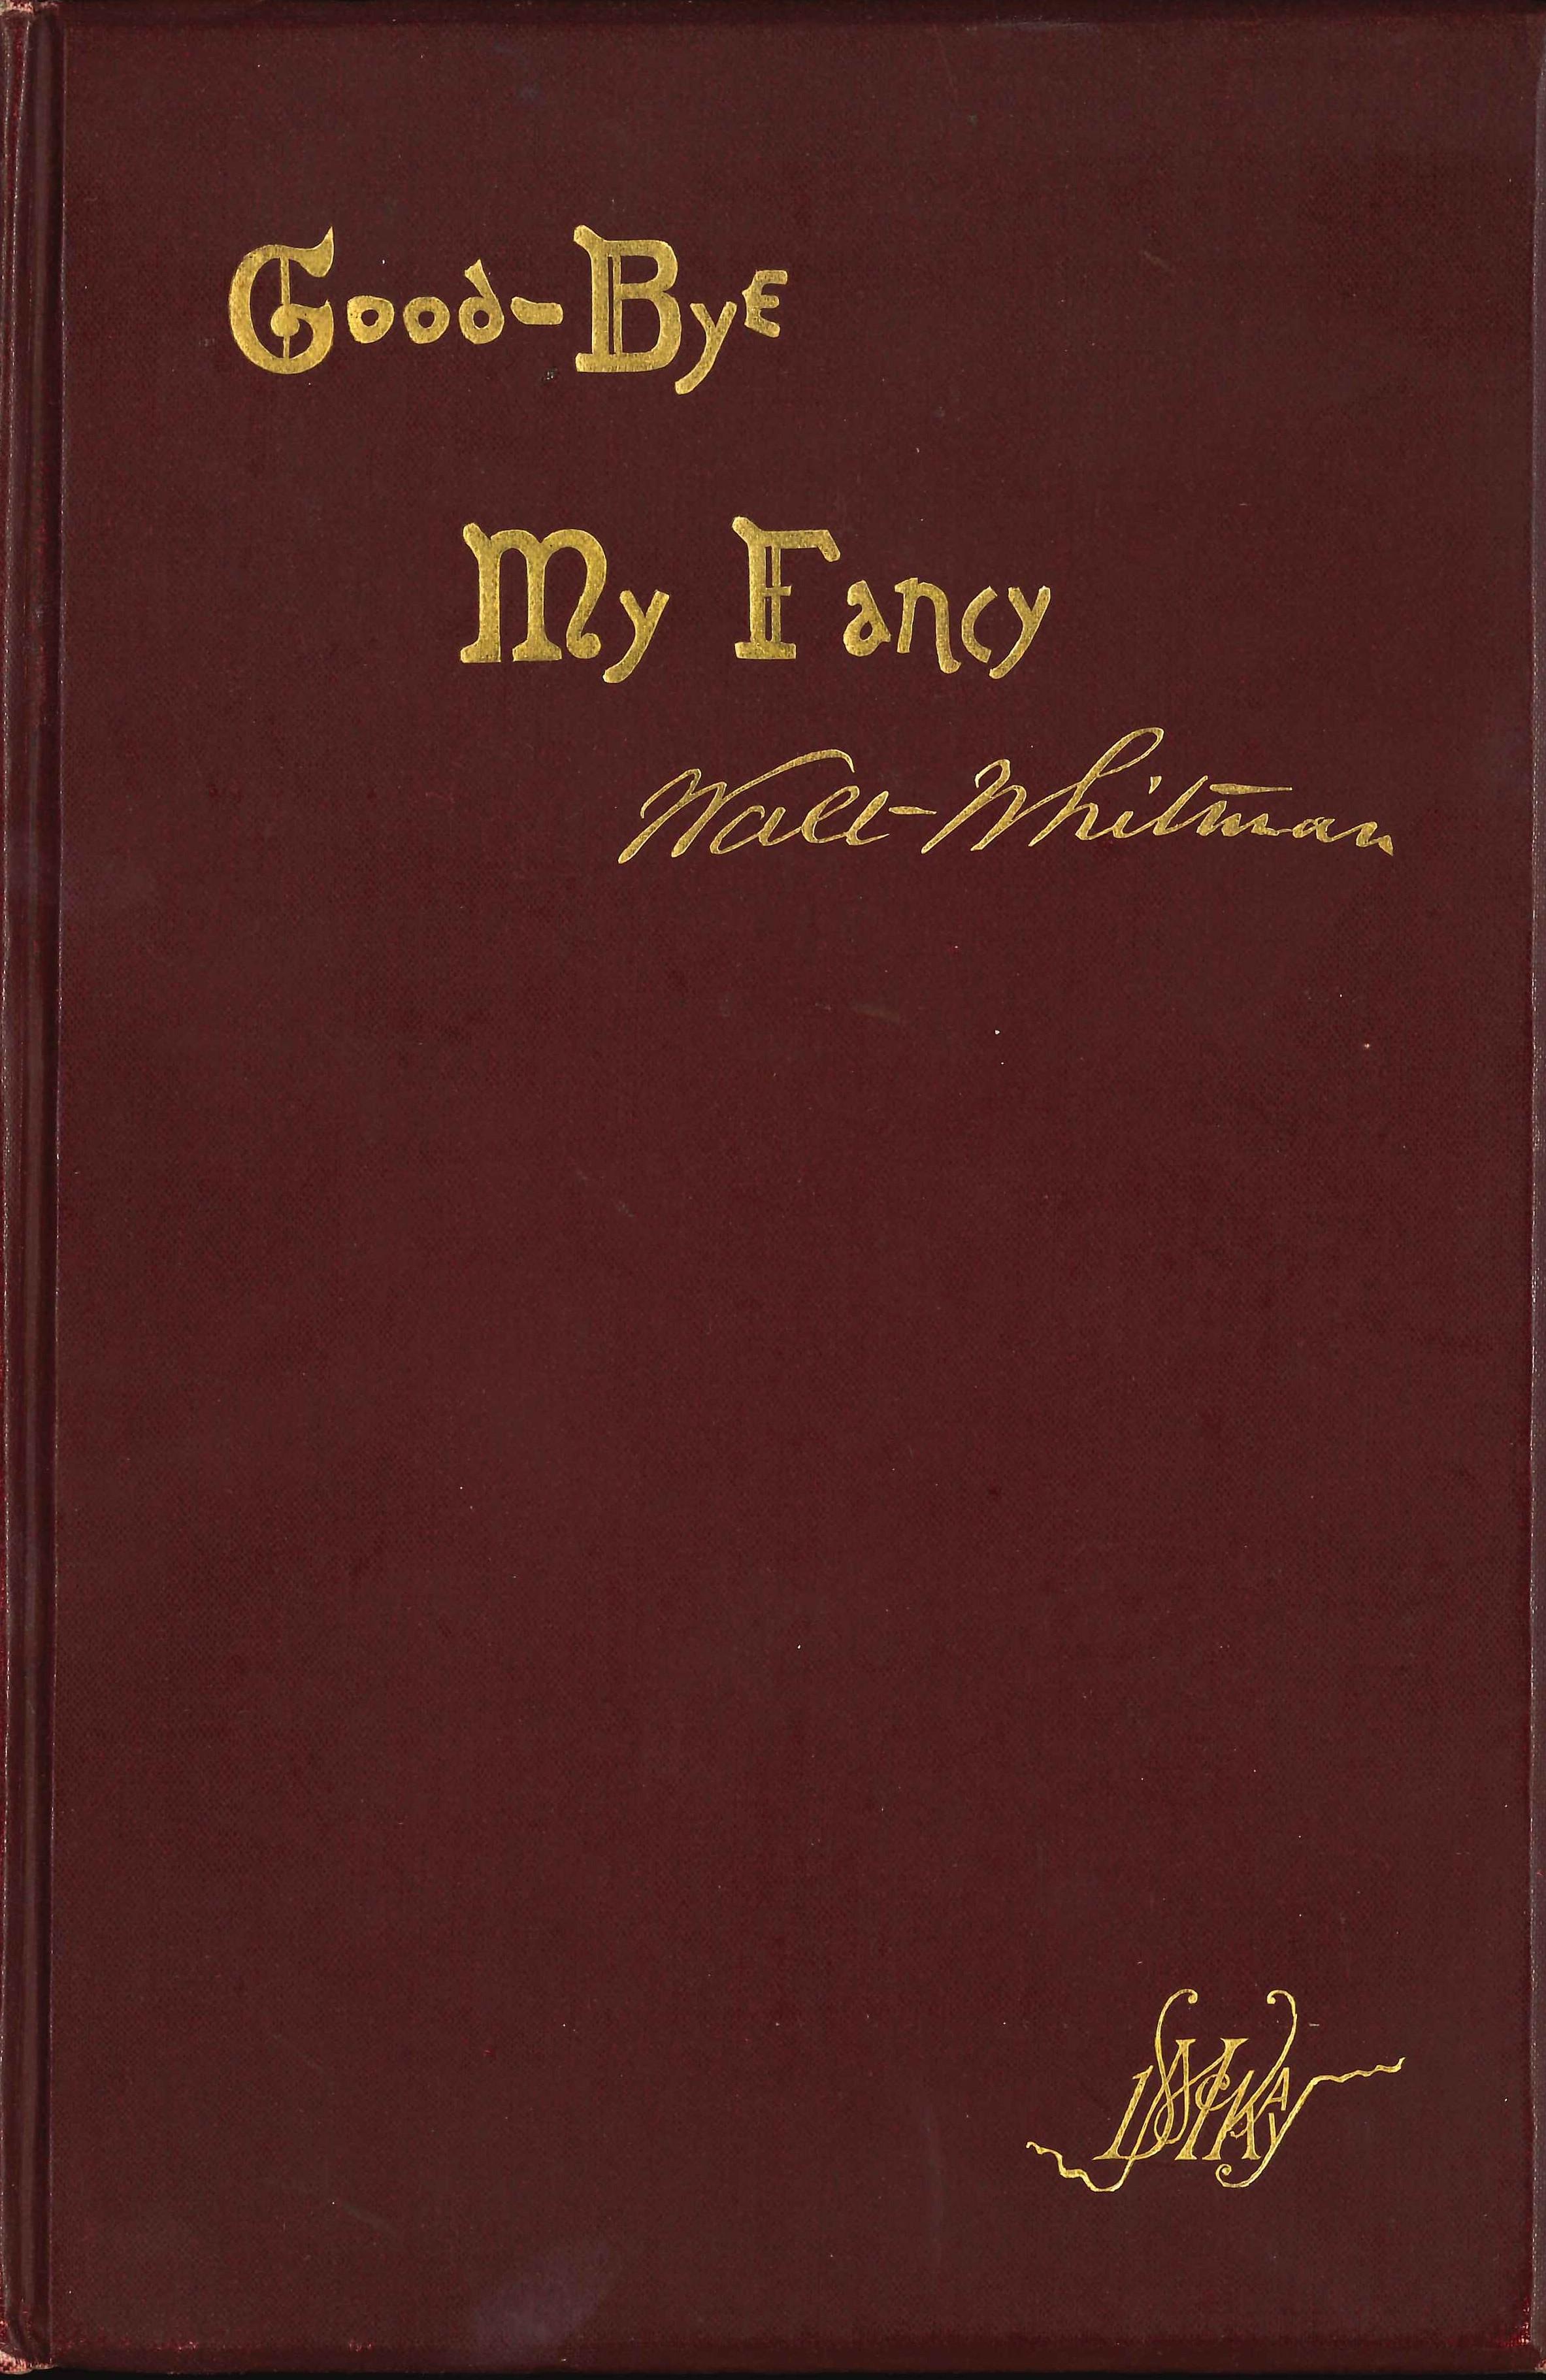 Walt Whitman. Good-Bye My Fancy: 2nd Annex to Leaves of Grass. Philadelphia: David McKay, 1891.